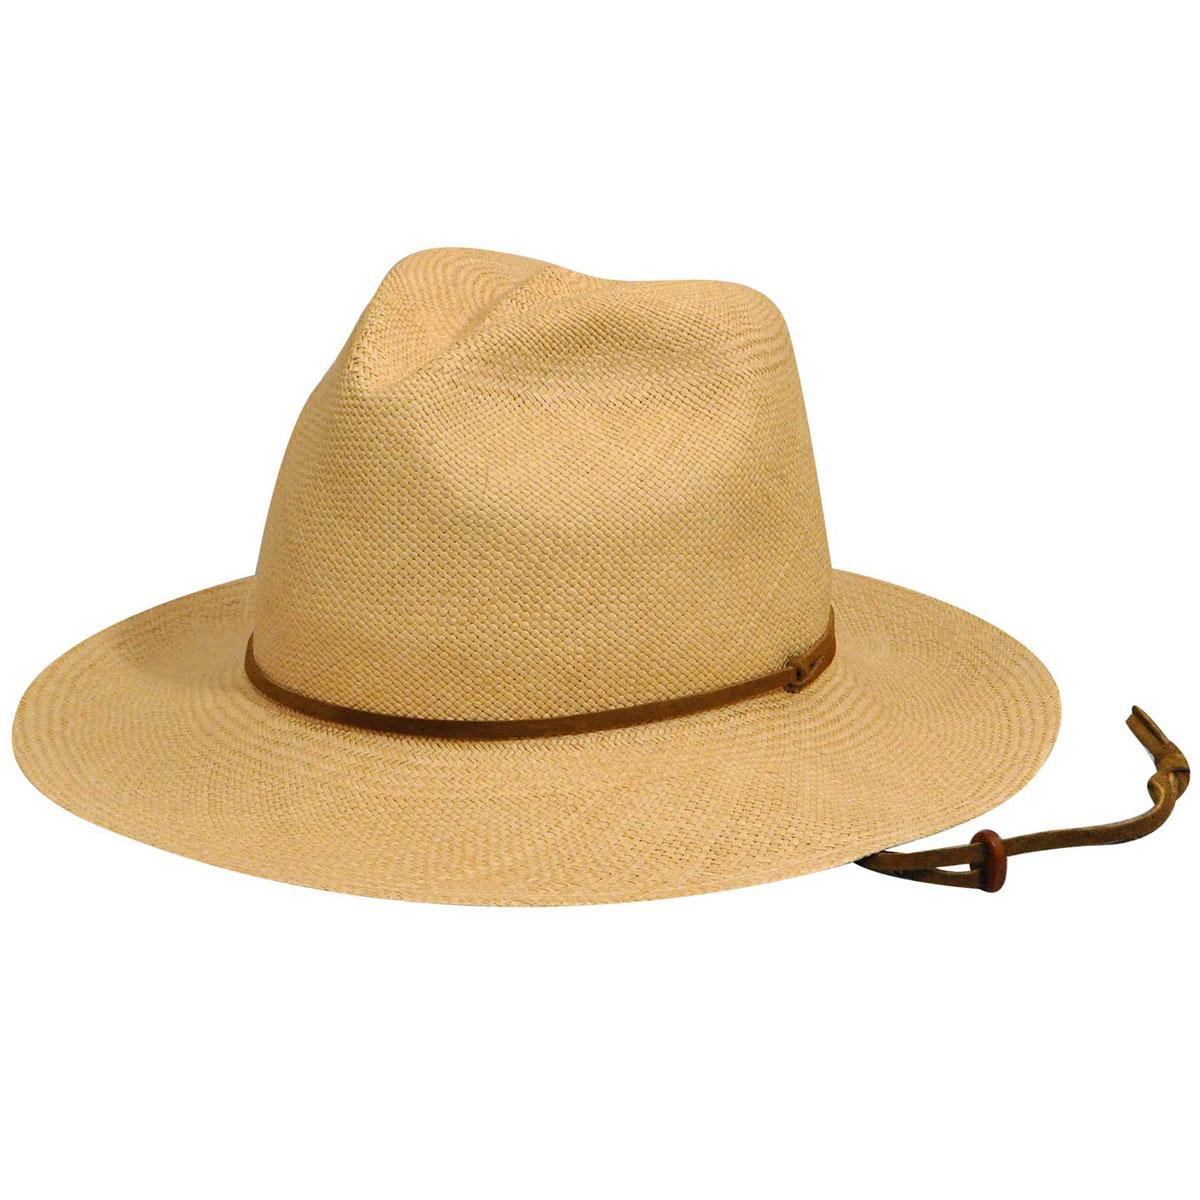 Pantropic Fedora Explorer Straw Hat in Dark Natural